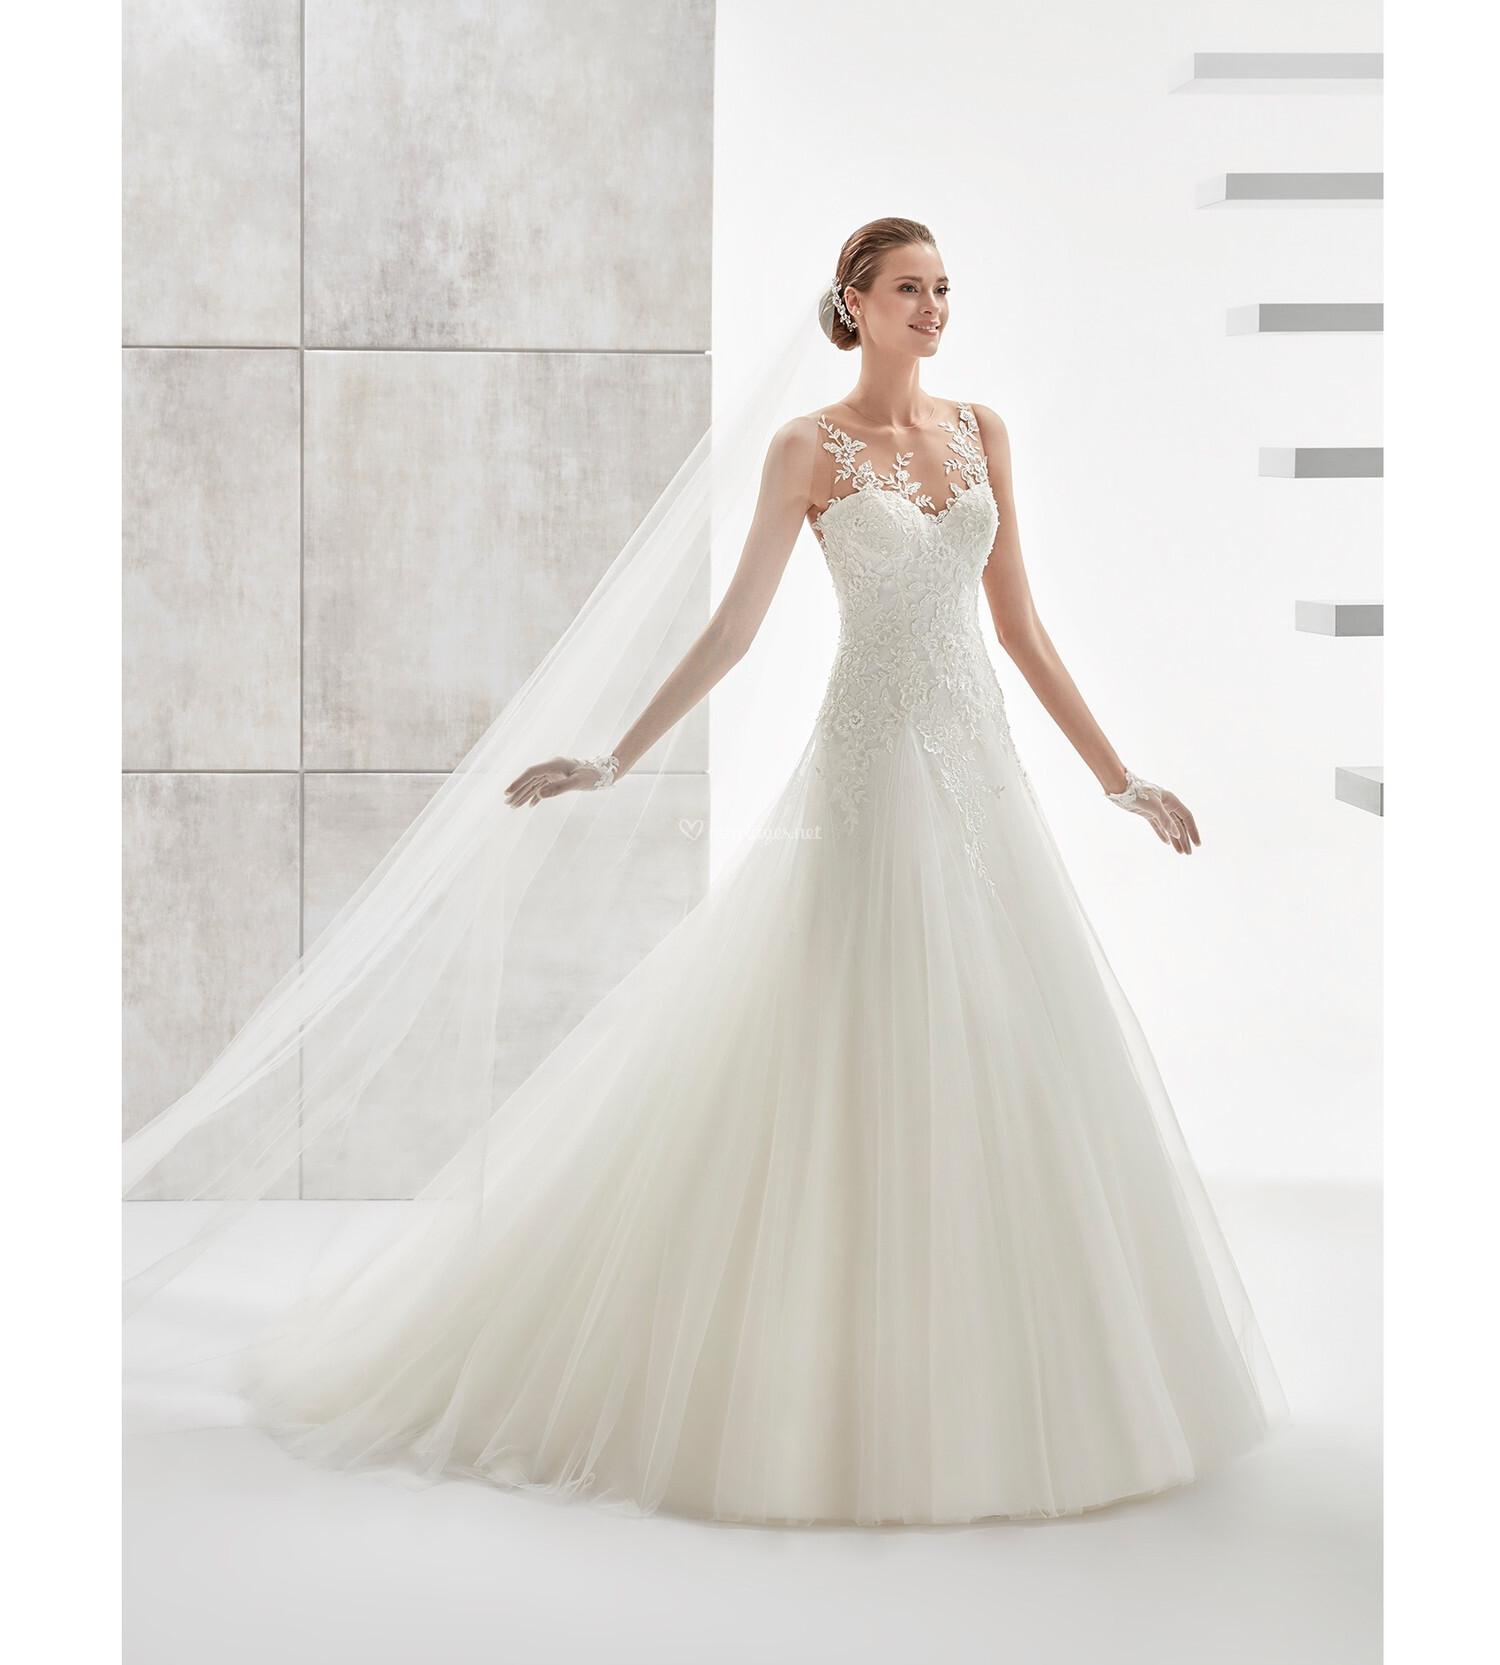 85f334092078d Robes de mariée de Aurora - 2017 - Mariages.net